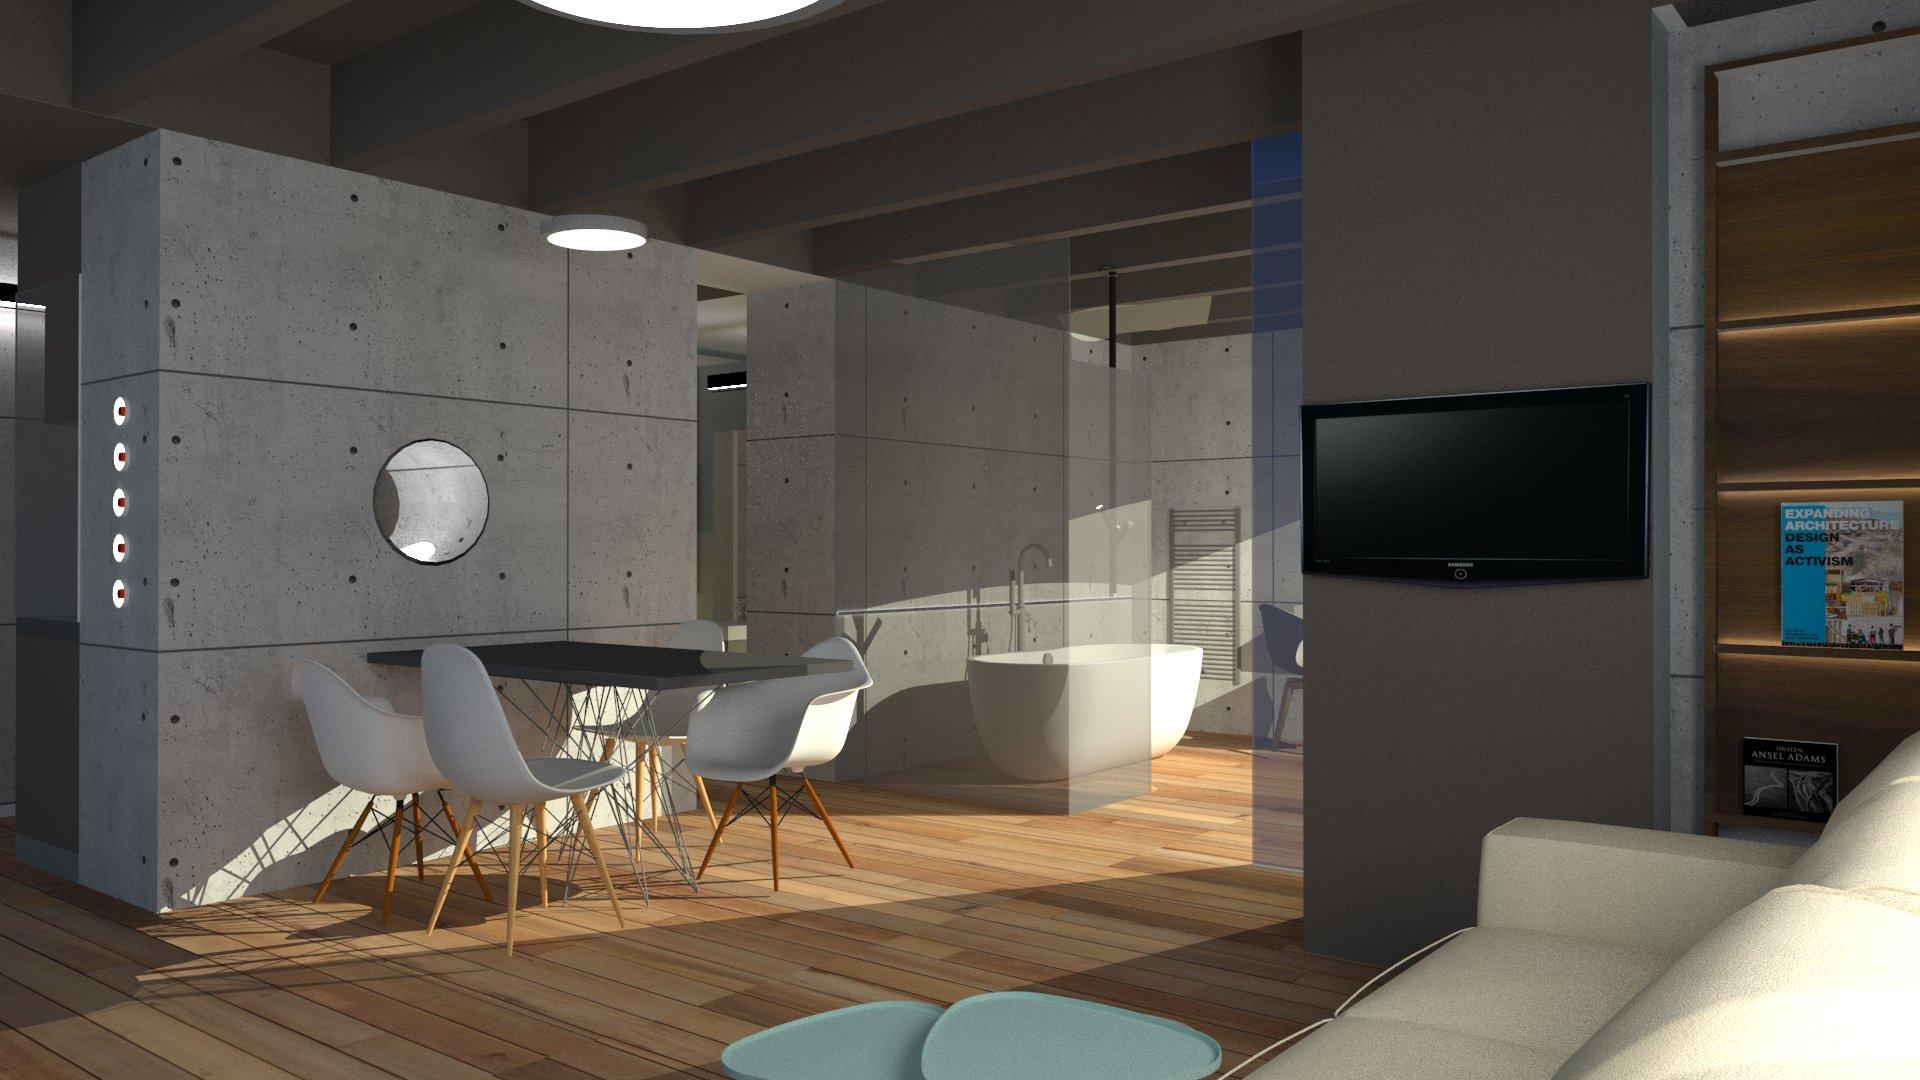 Apartmani Beograd | Luksuzni apartmani u Beogradu | Apartman A34 - Dnevni boravak i trpezarija